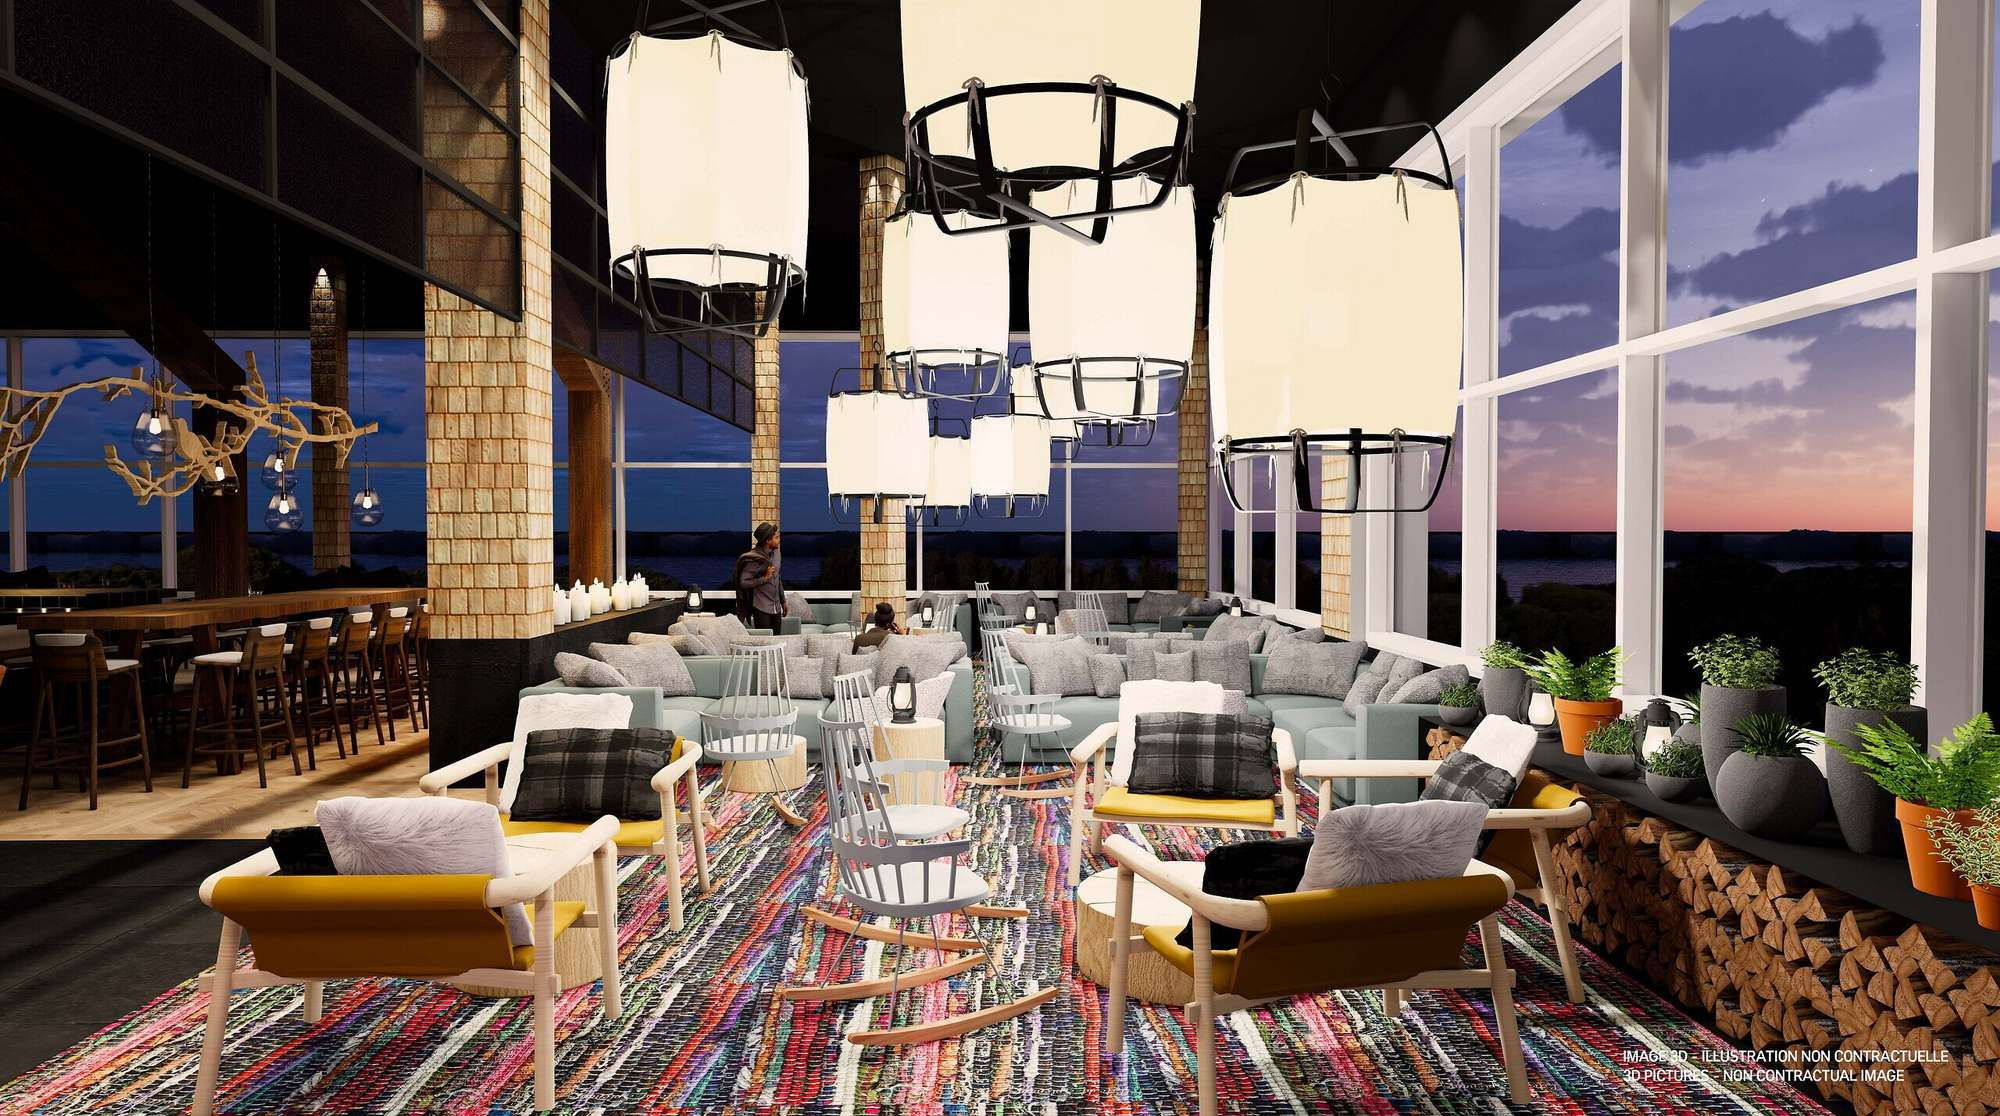 Club Med Charlevoix artist impression lobby by night